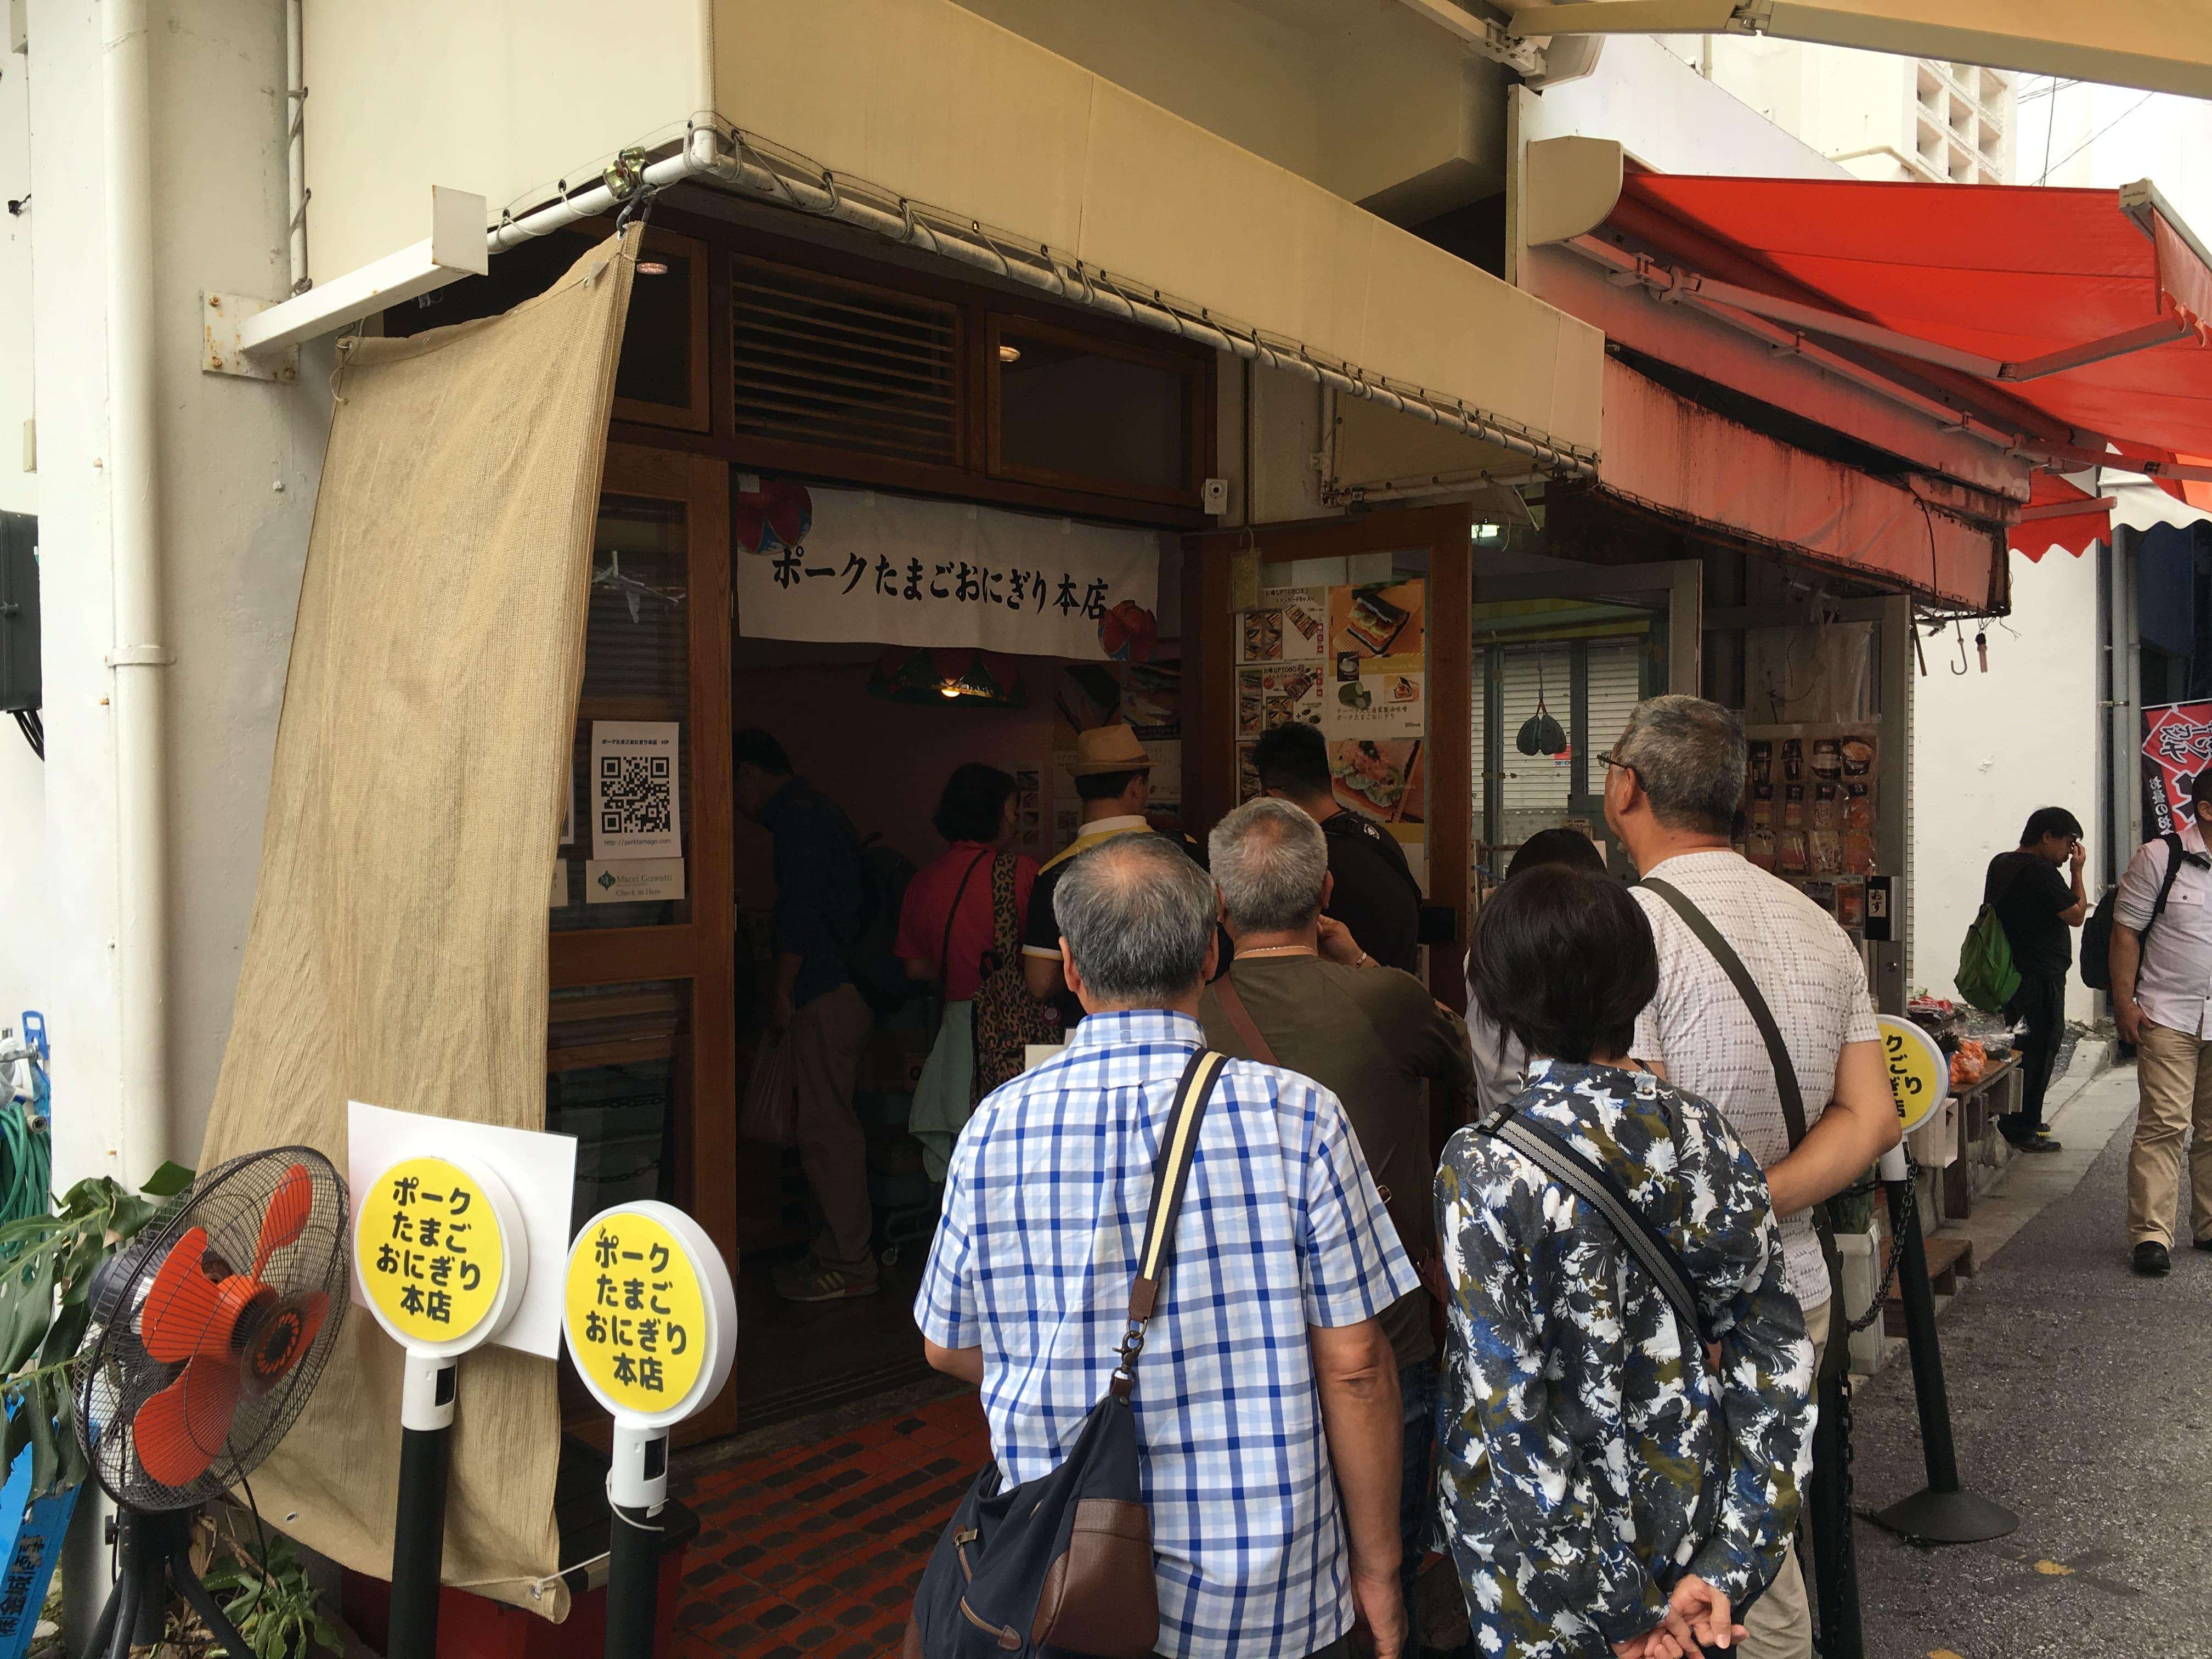 Onigiri de ovo de porco principal loja perto de mercado público de Makishi